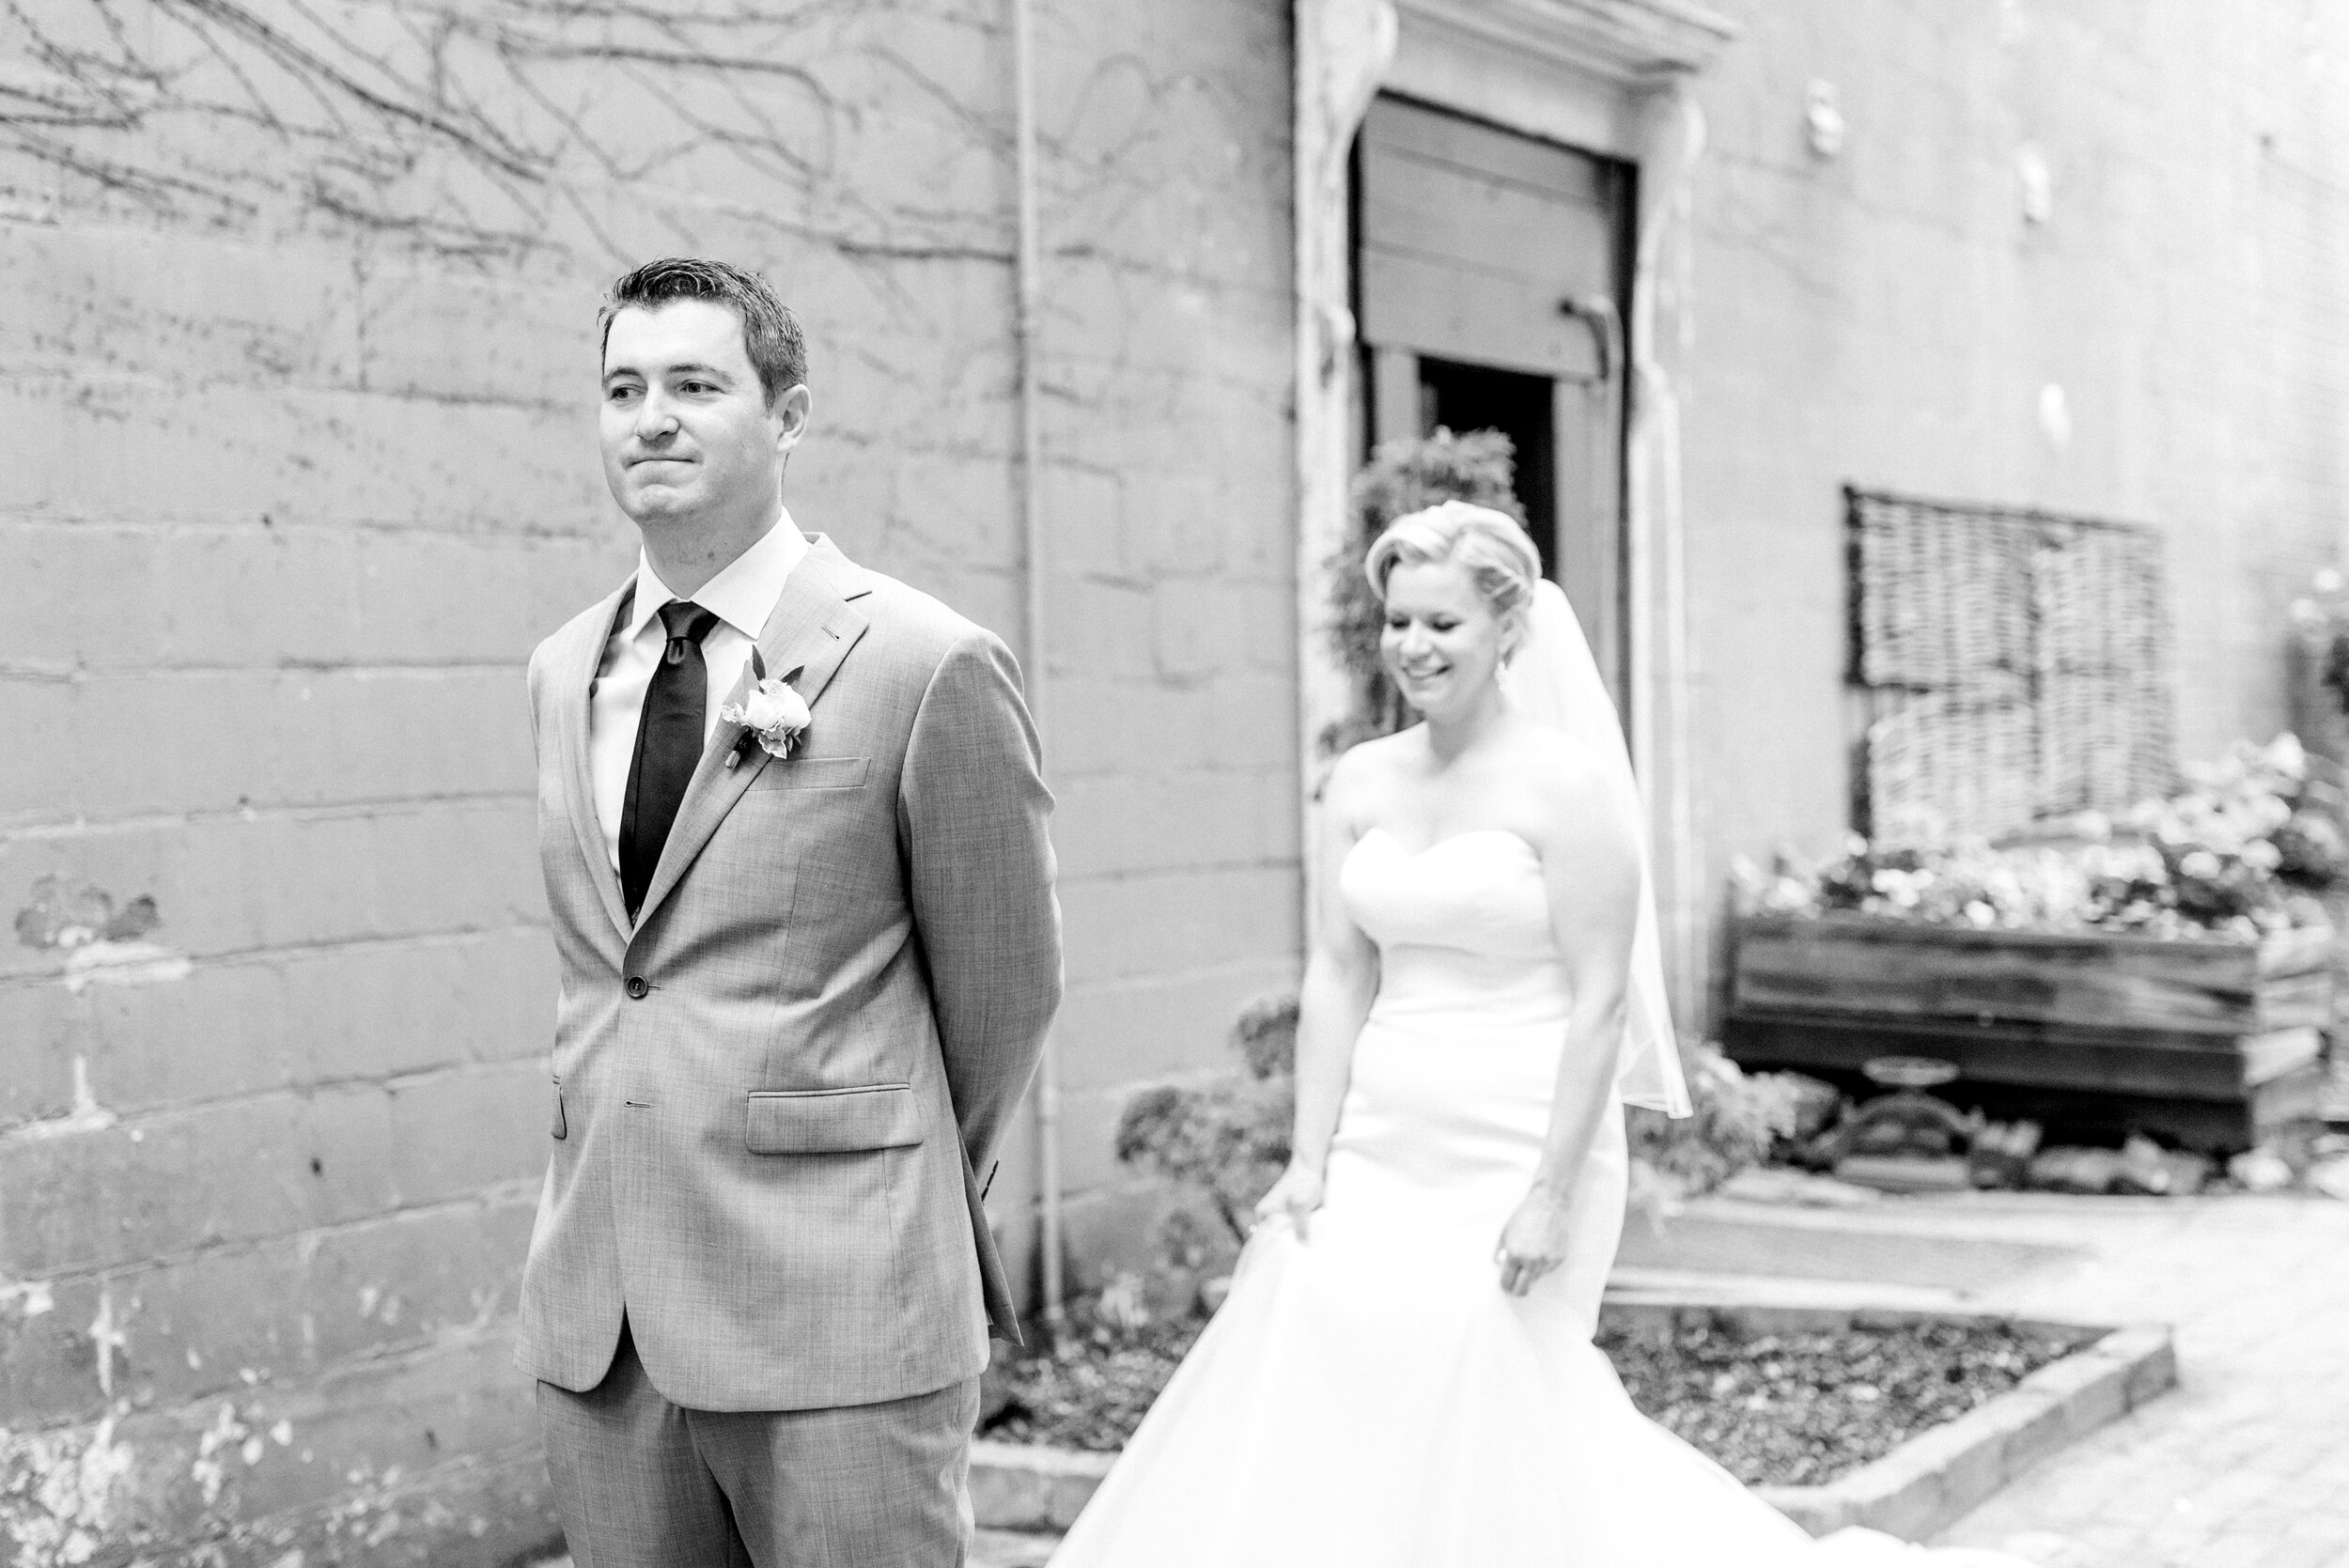 berkeley-field-house-wedding-kj-and-co-3.jpg